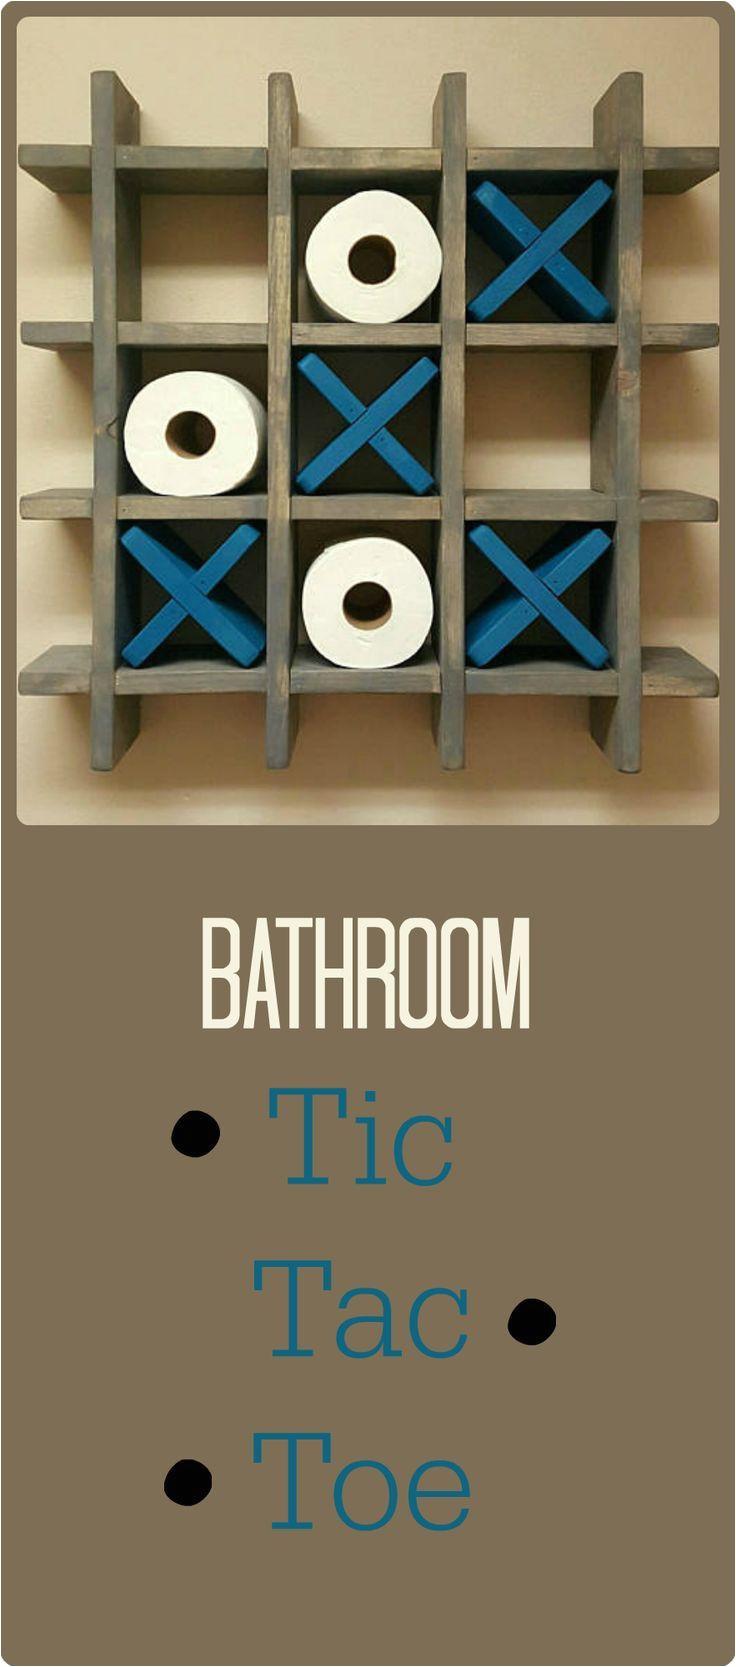 bathroom tic tac toe made to order toilet paper holder toilet paper tic tac toe pallet wall art floating shelf decor farmhouse